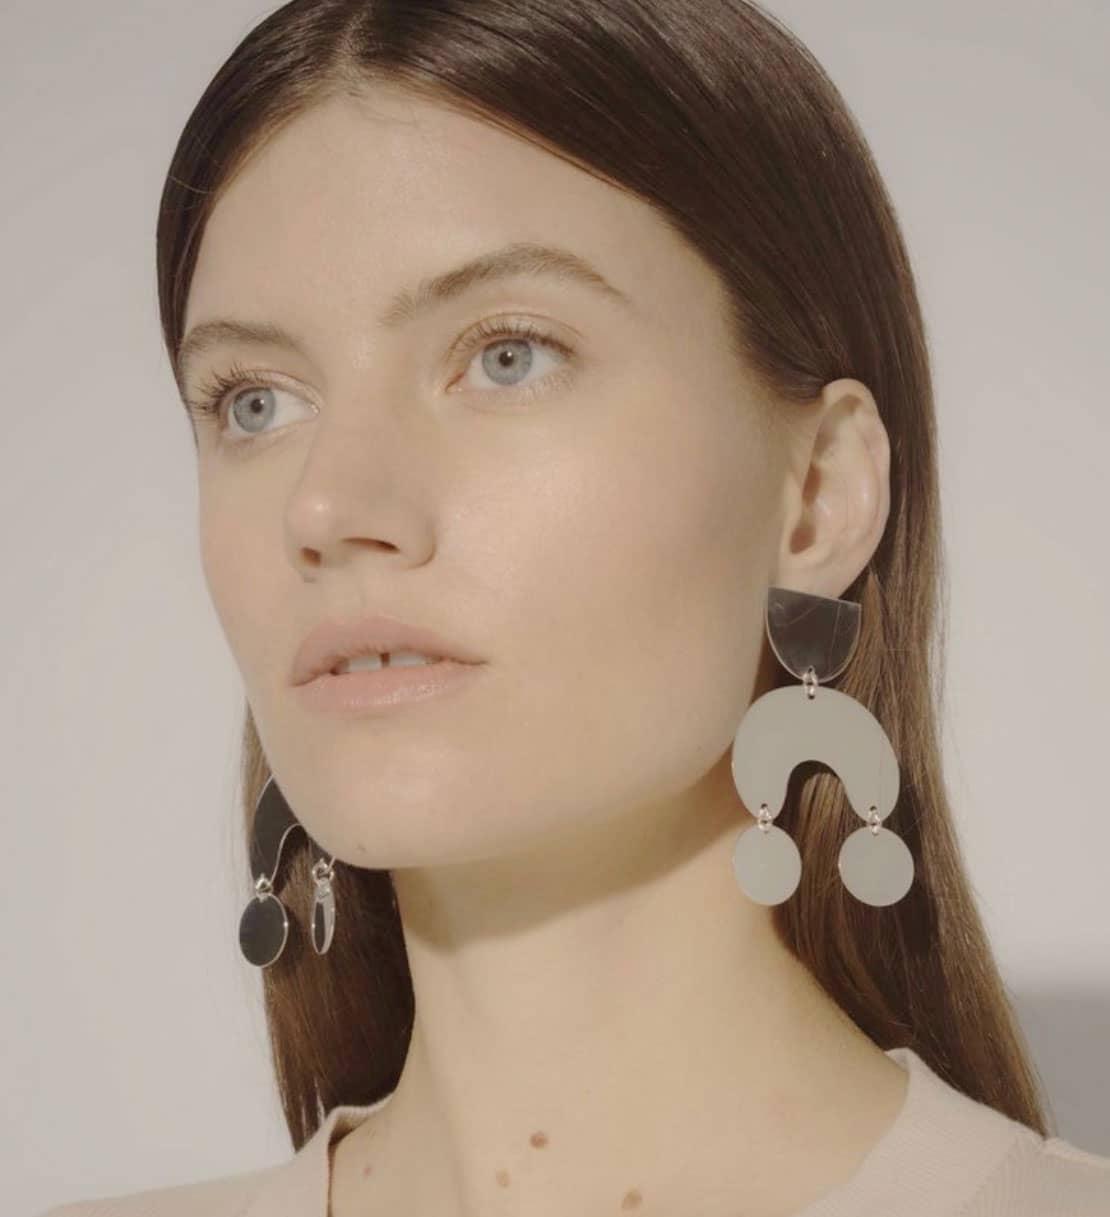 Modern Weaving - Moondancer Statement Earrings - Sterling Silver